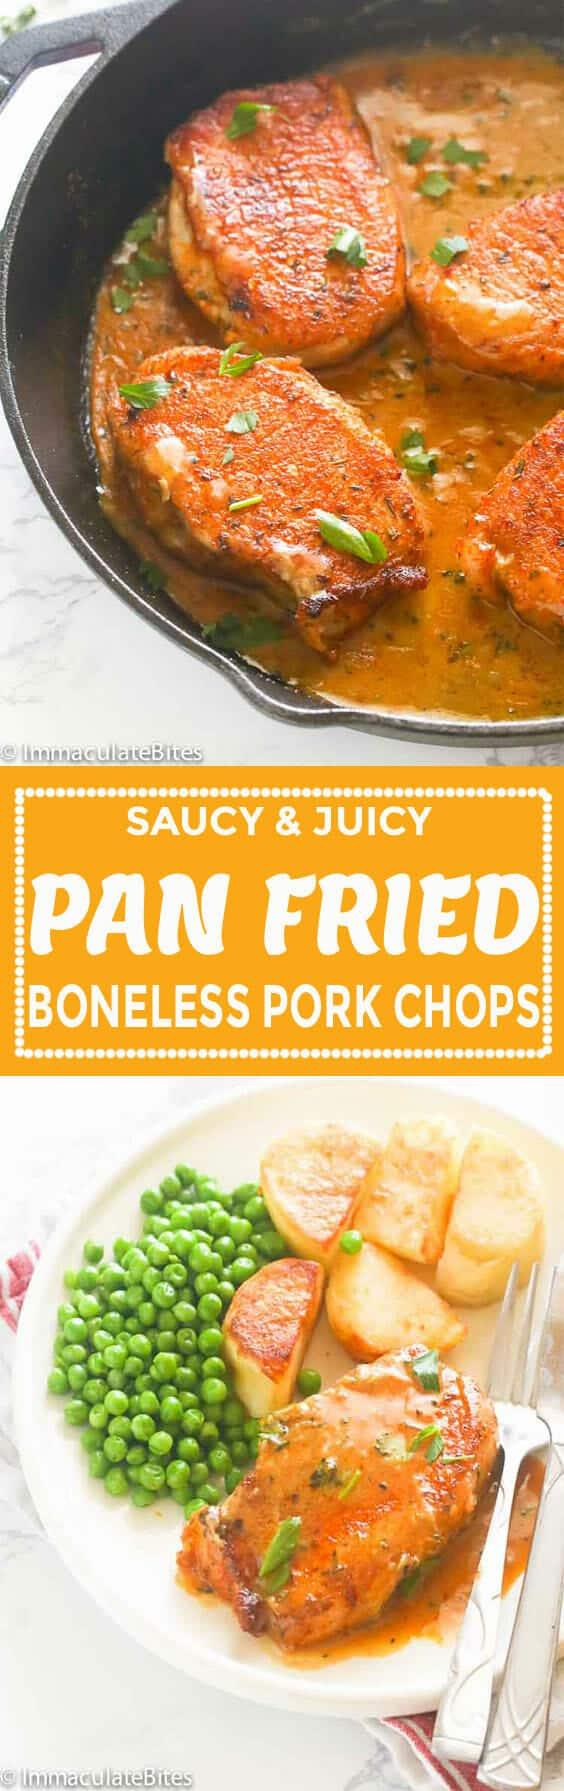 Pan Fried Boneless Pork Chops